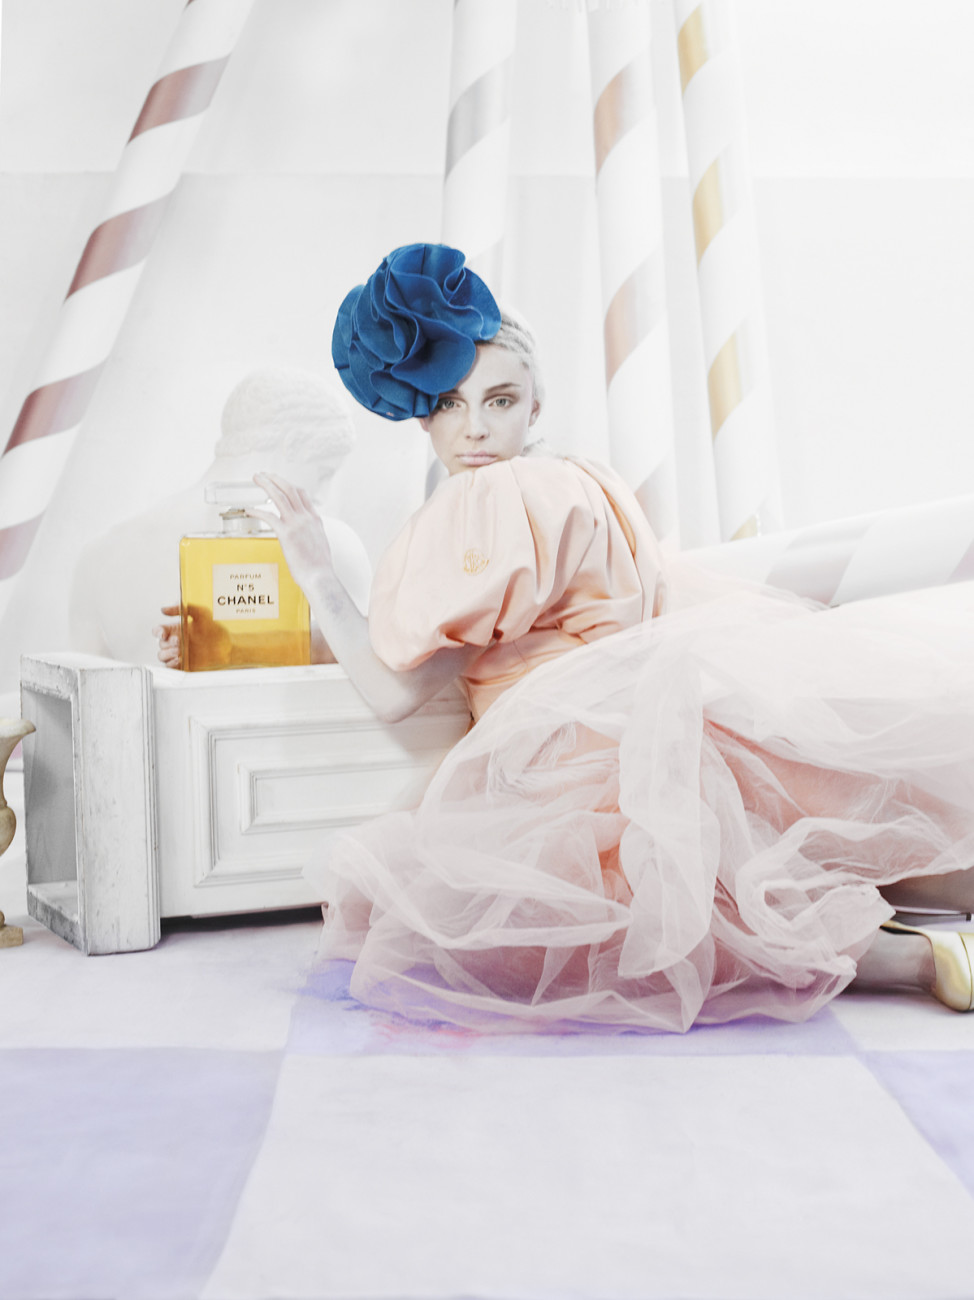 alice_annibalini_post_produzione_retouch_vanity_fair_gastel_art_gallery